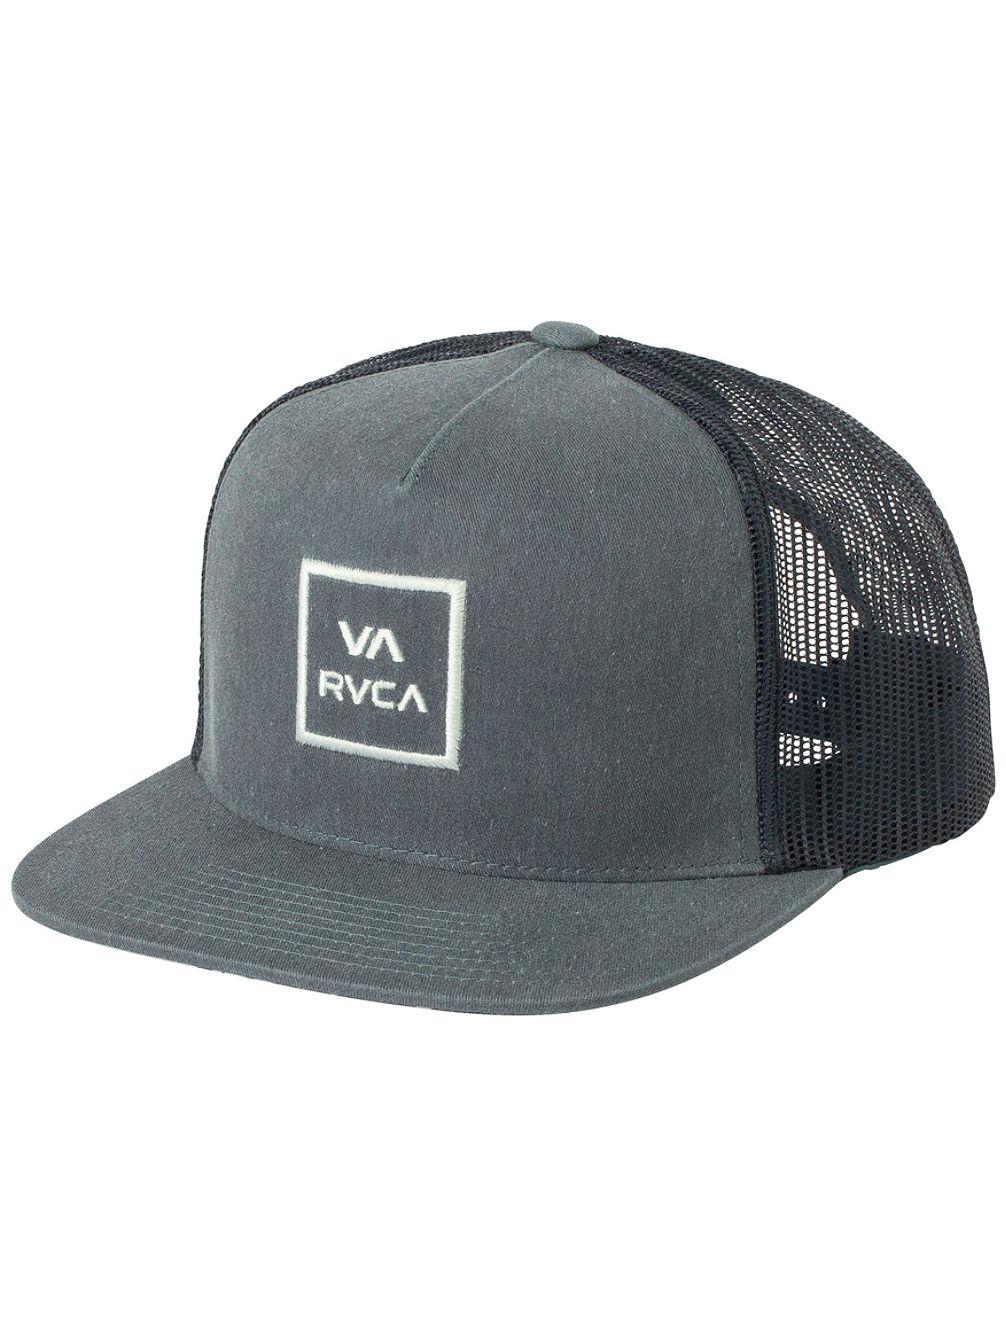 927d21ef Buy RVCA Va All The Way Trucker Cap online at Blue Tomato